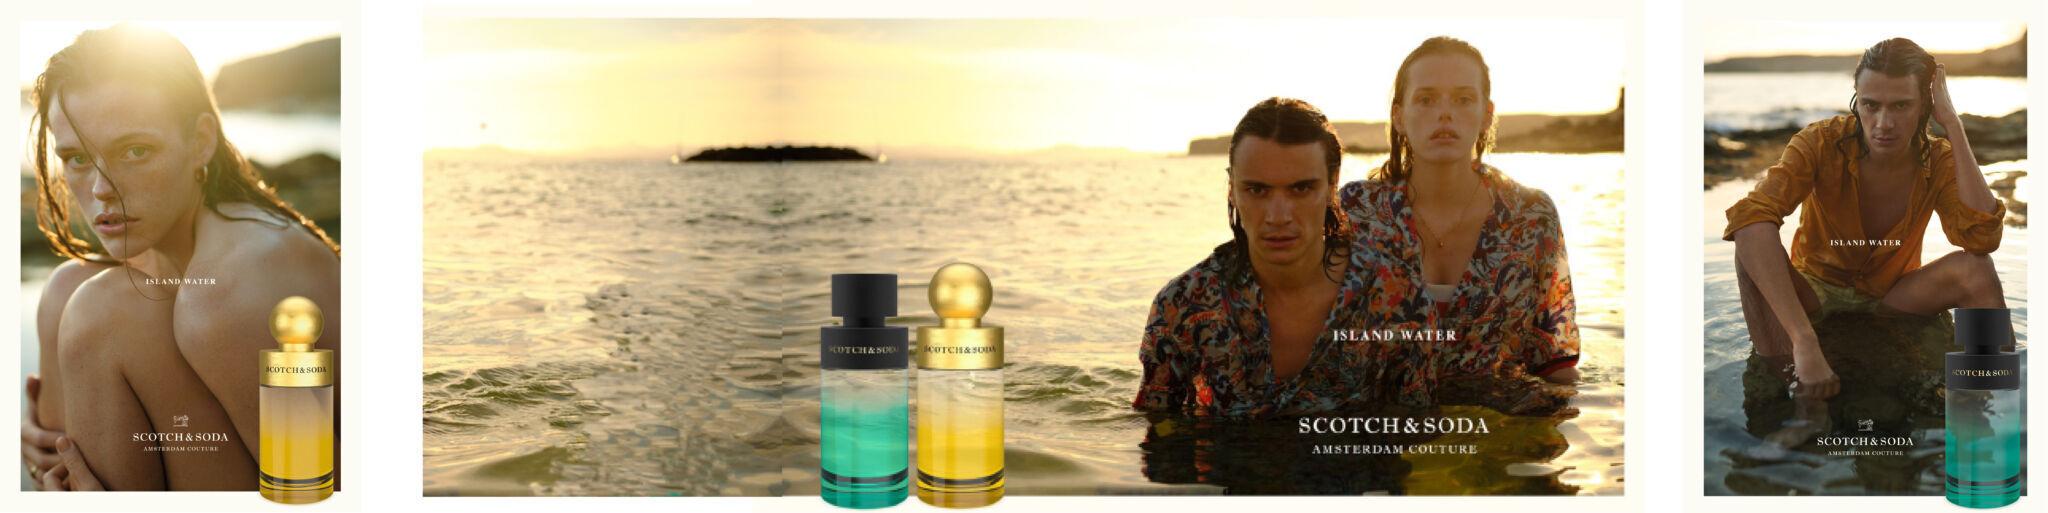 Scotch & Soda Island Water